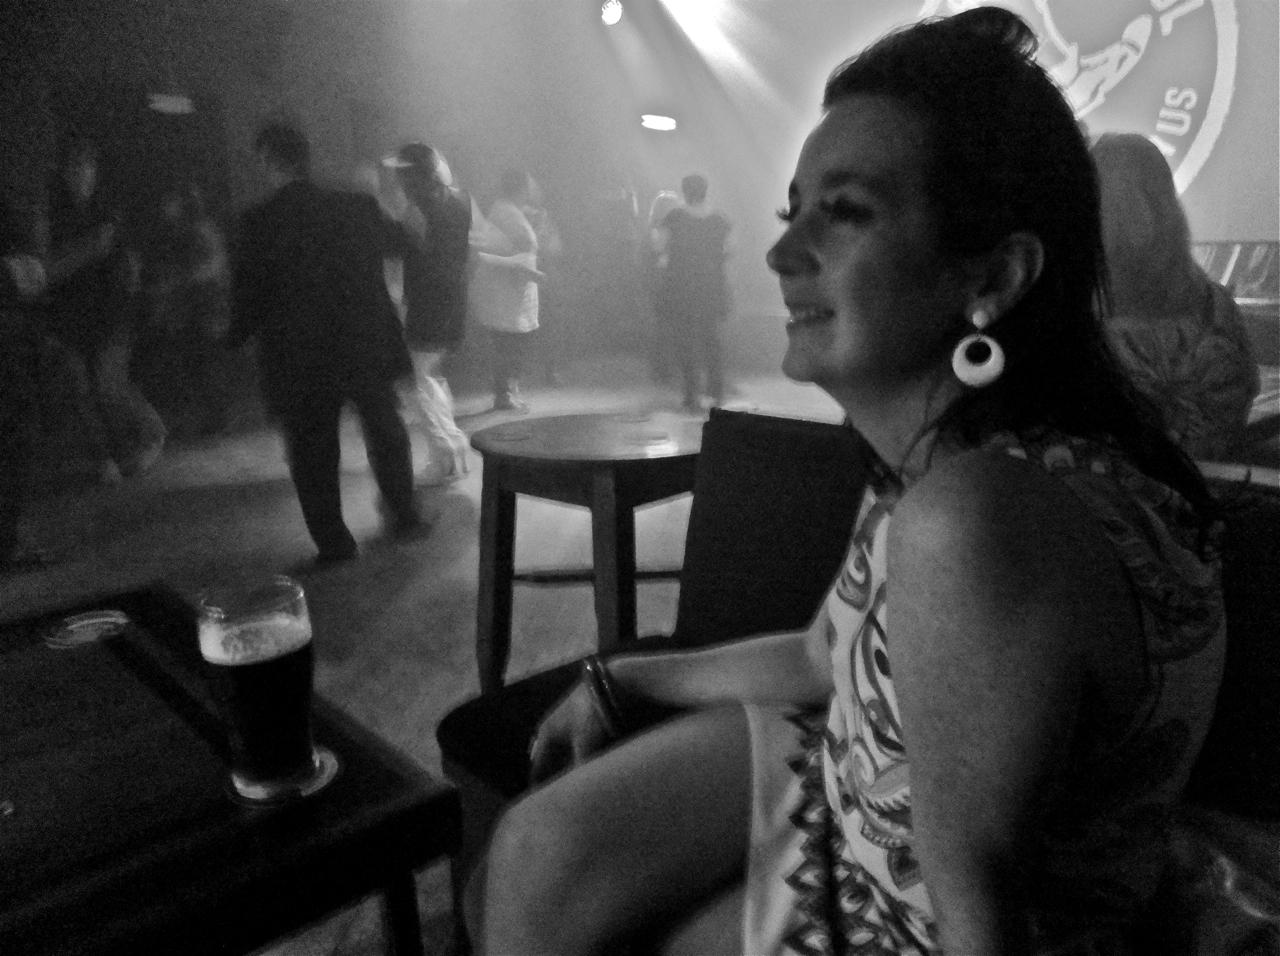 Clare club night, 4/10/13